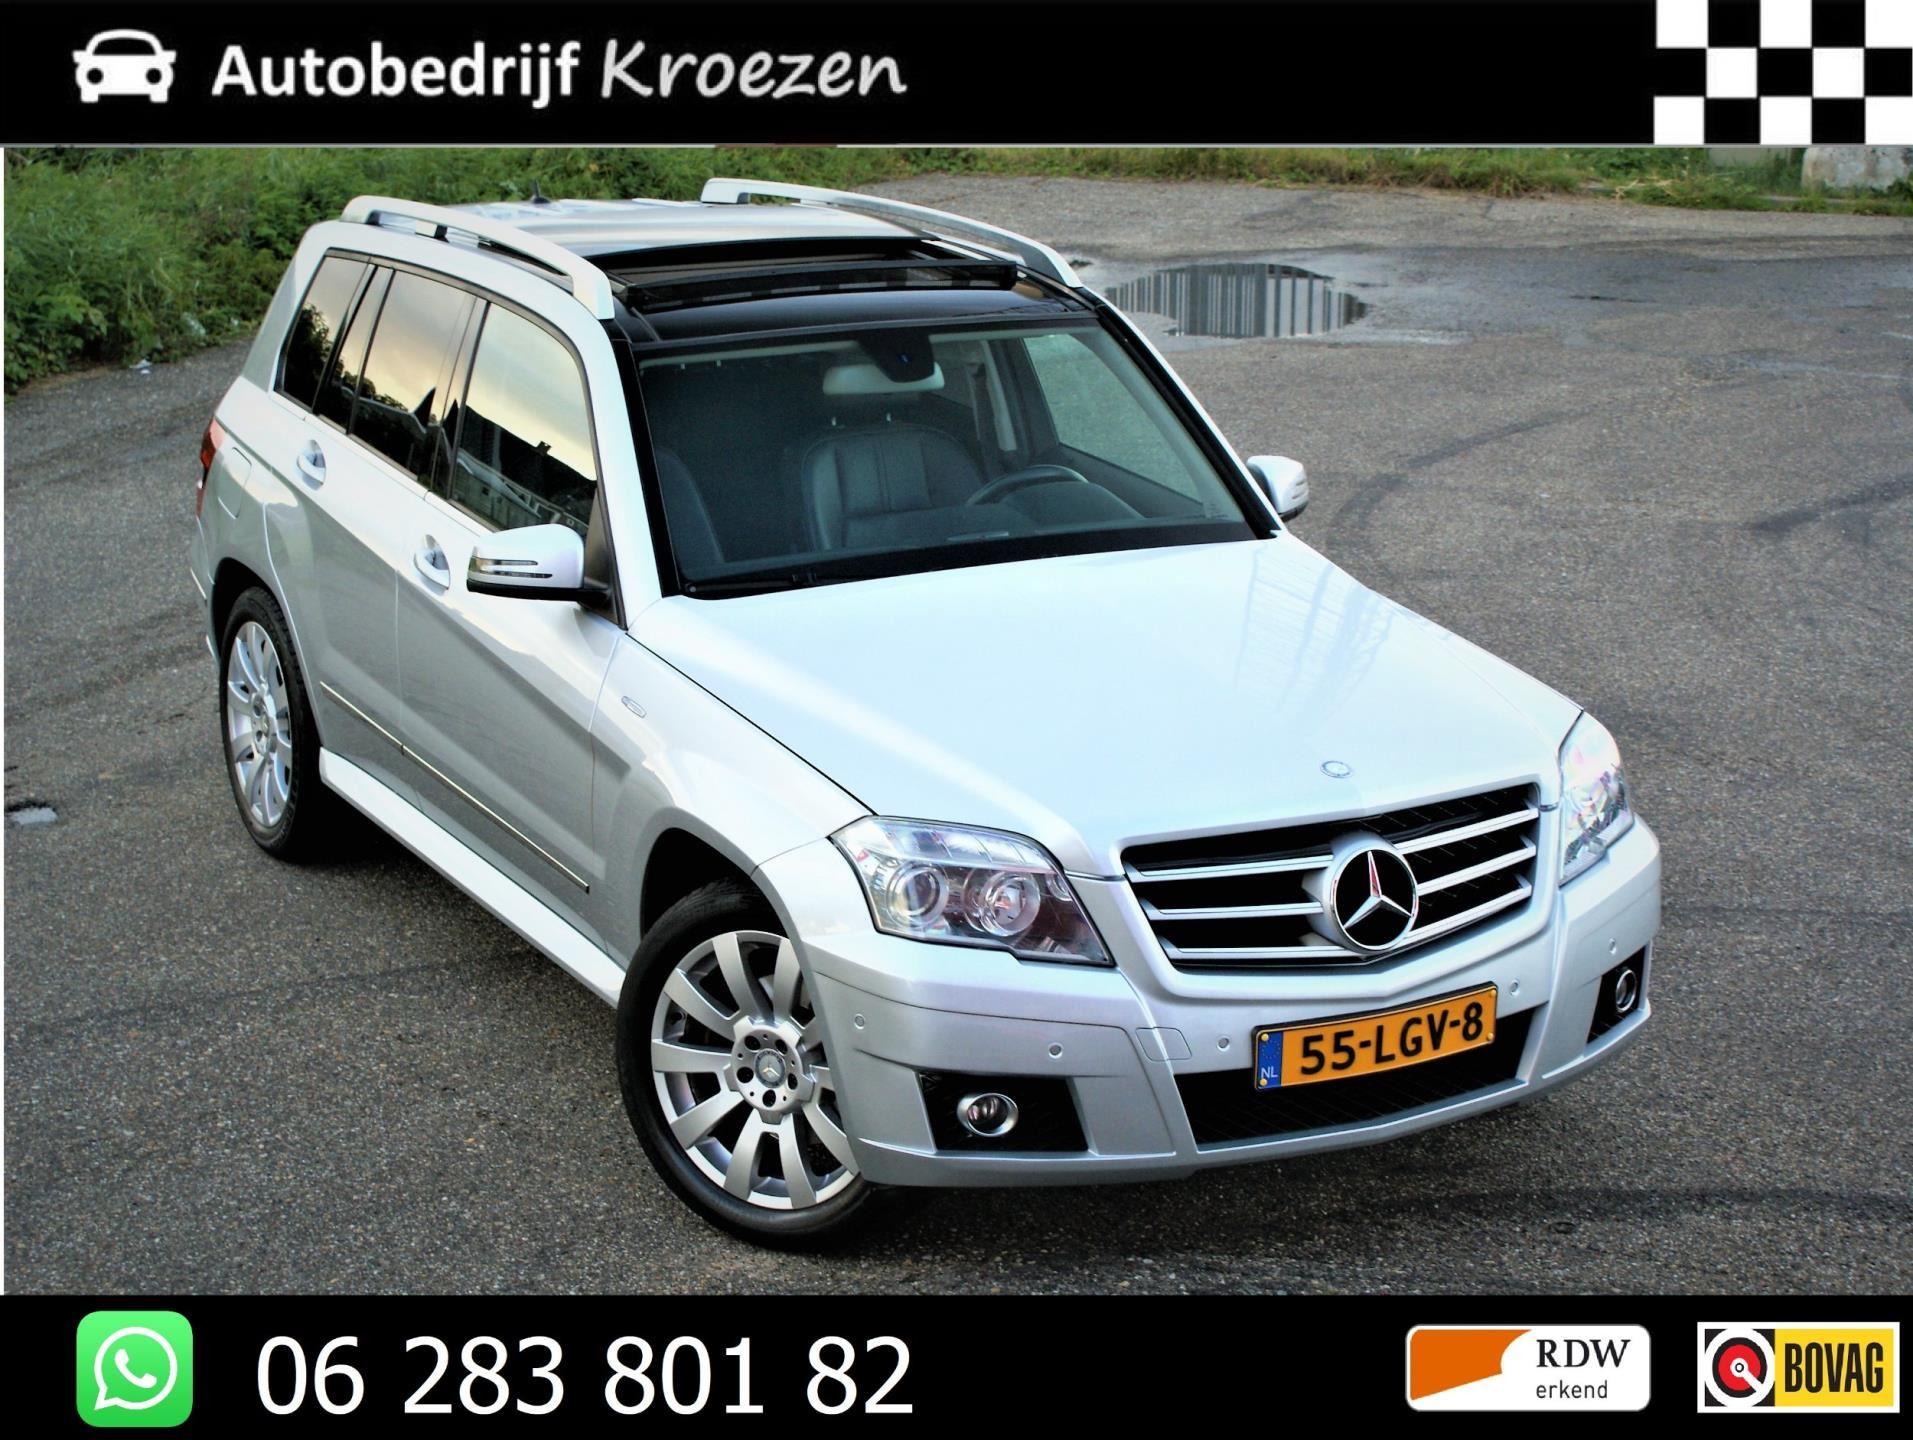 Mercedes-Benz GLK-klasse occasion - Autobedrijf Kroezen